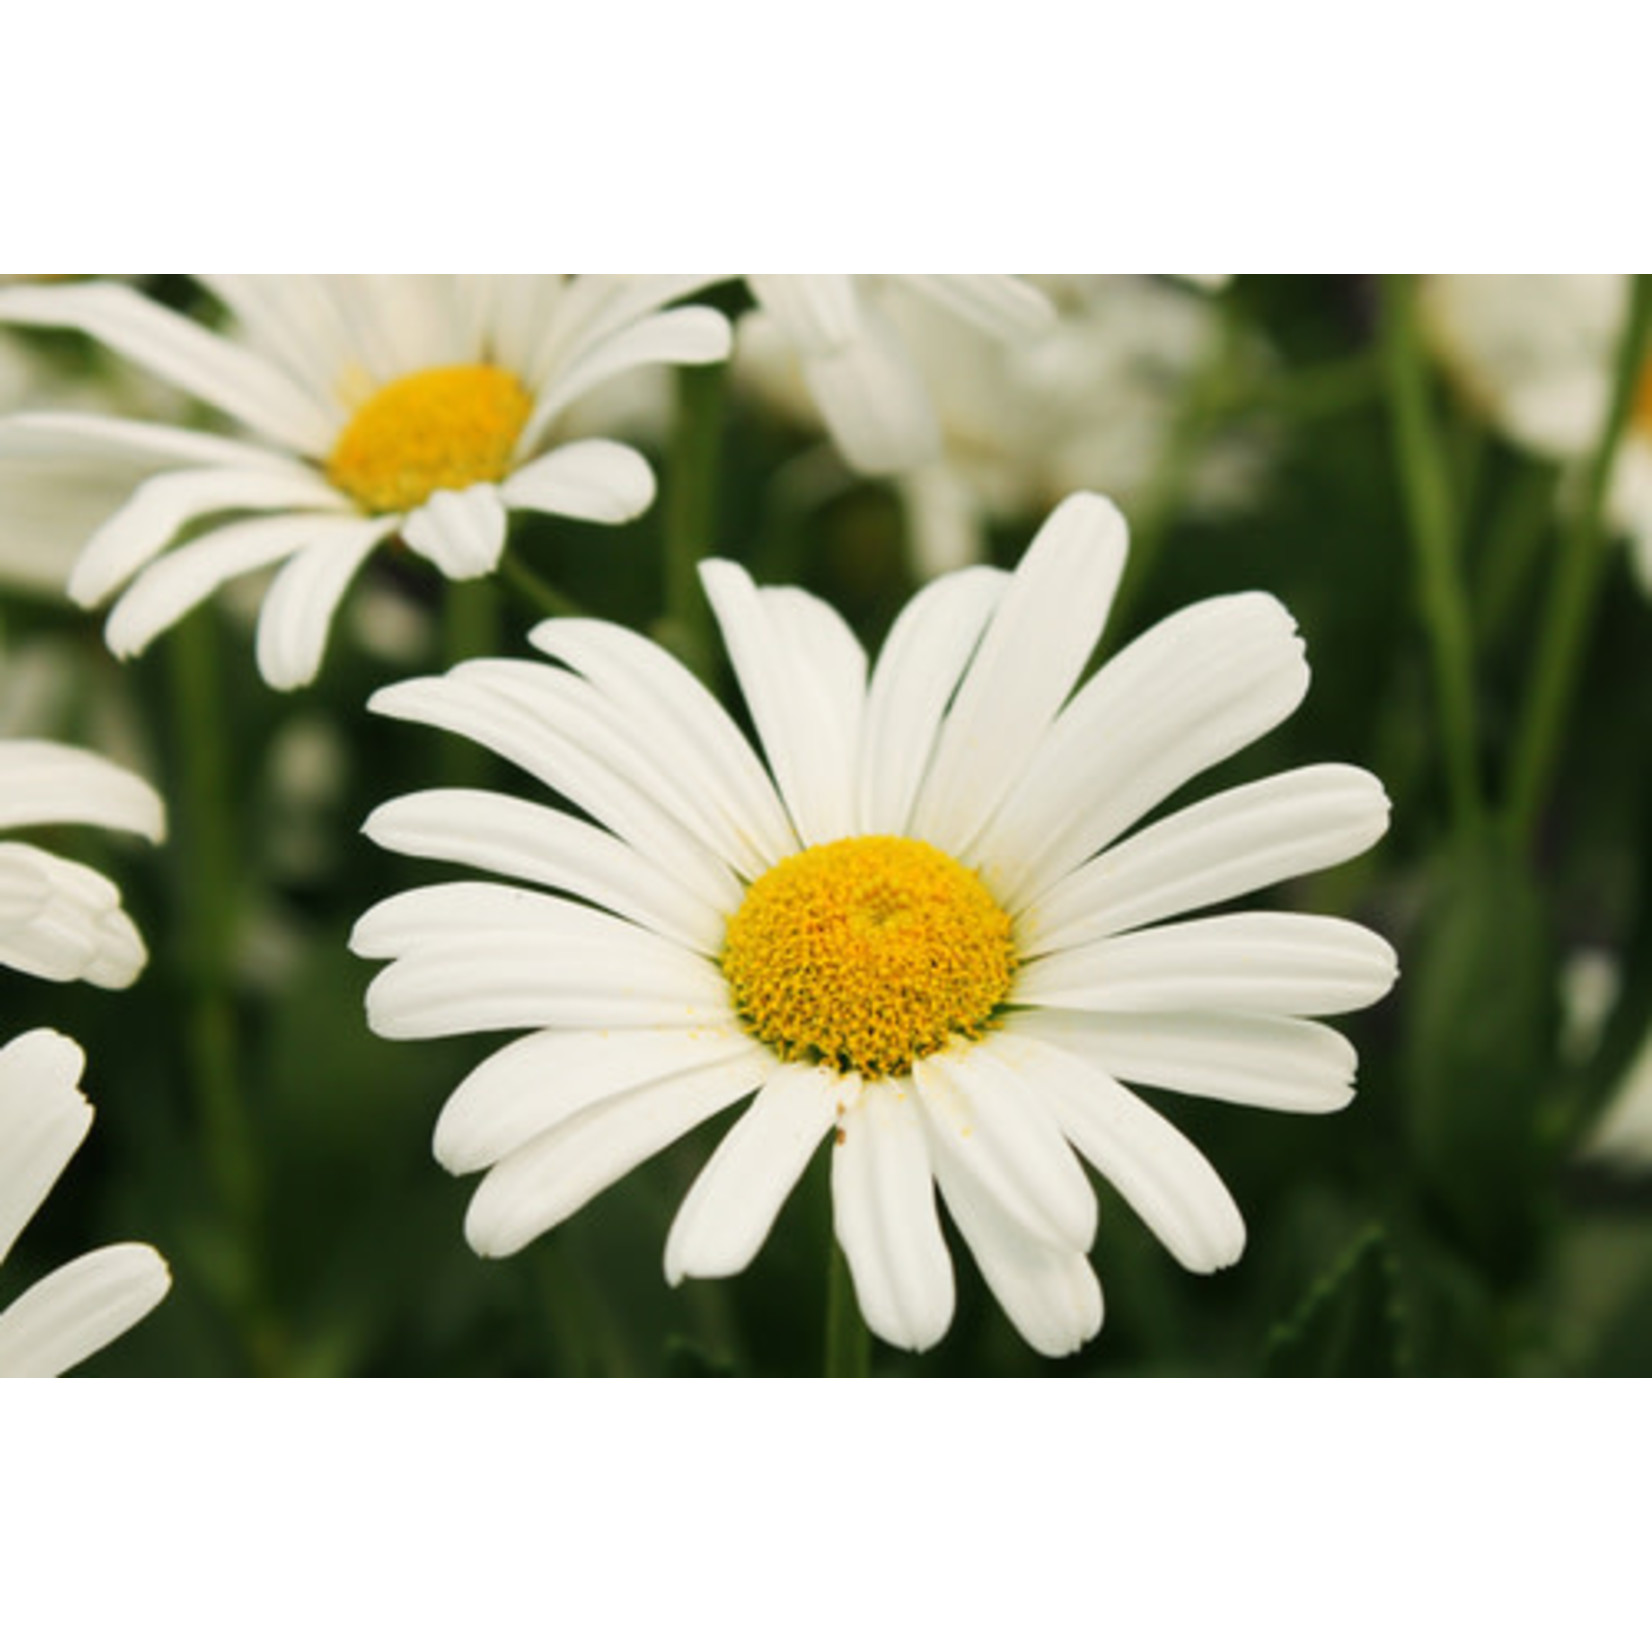 Shasta Daisy 'highland white dream' 1 gal